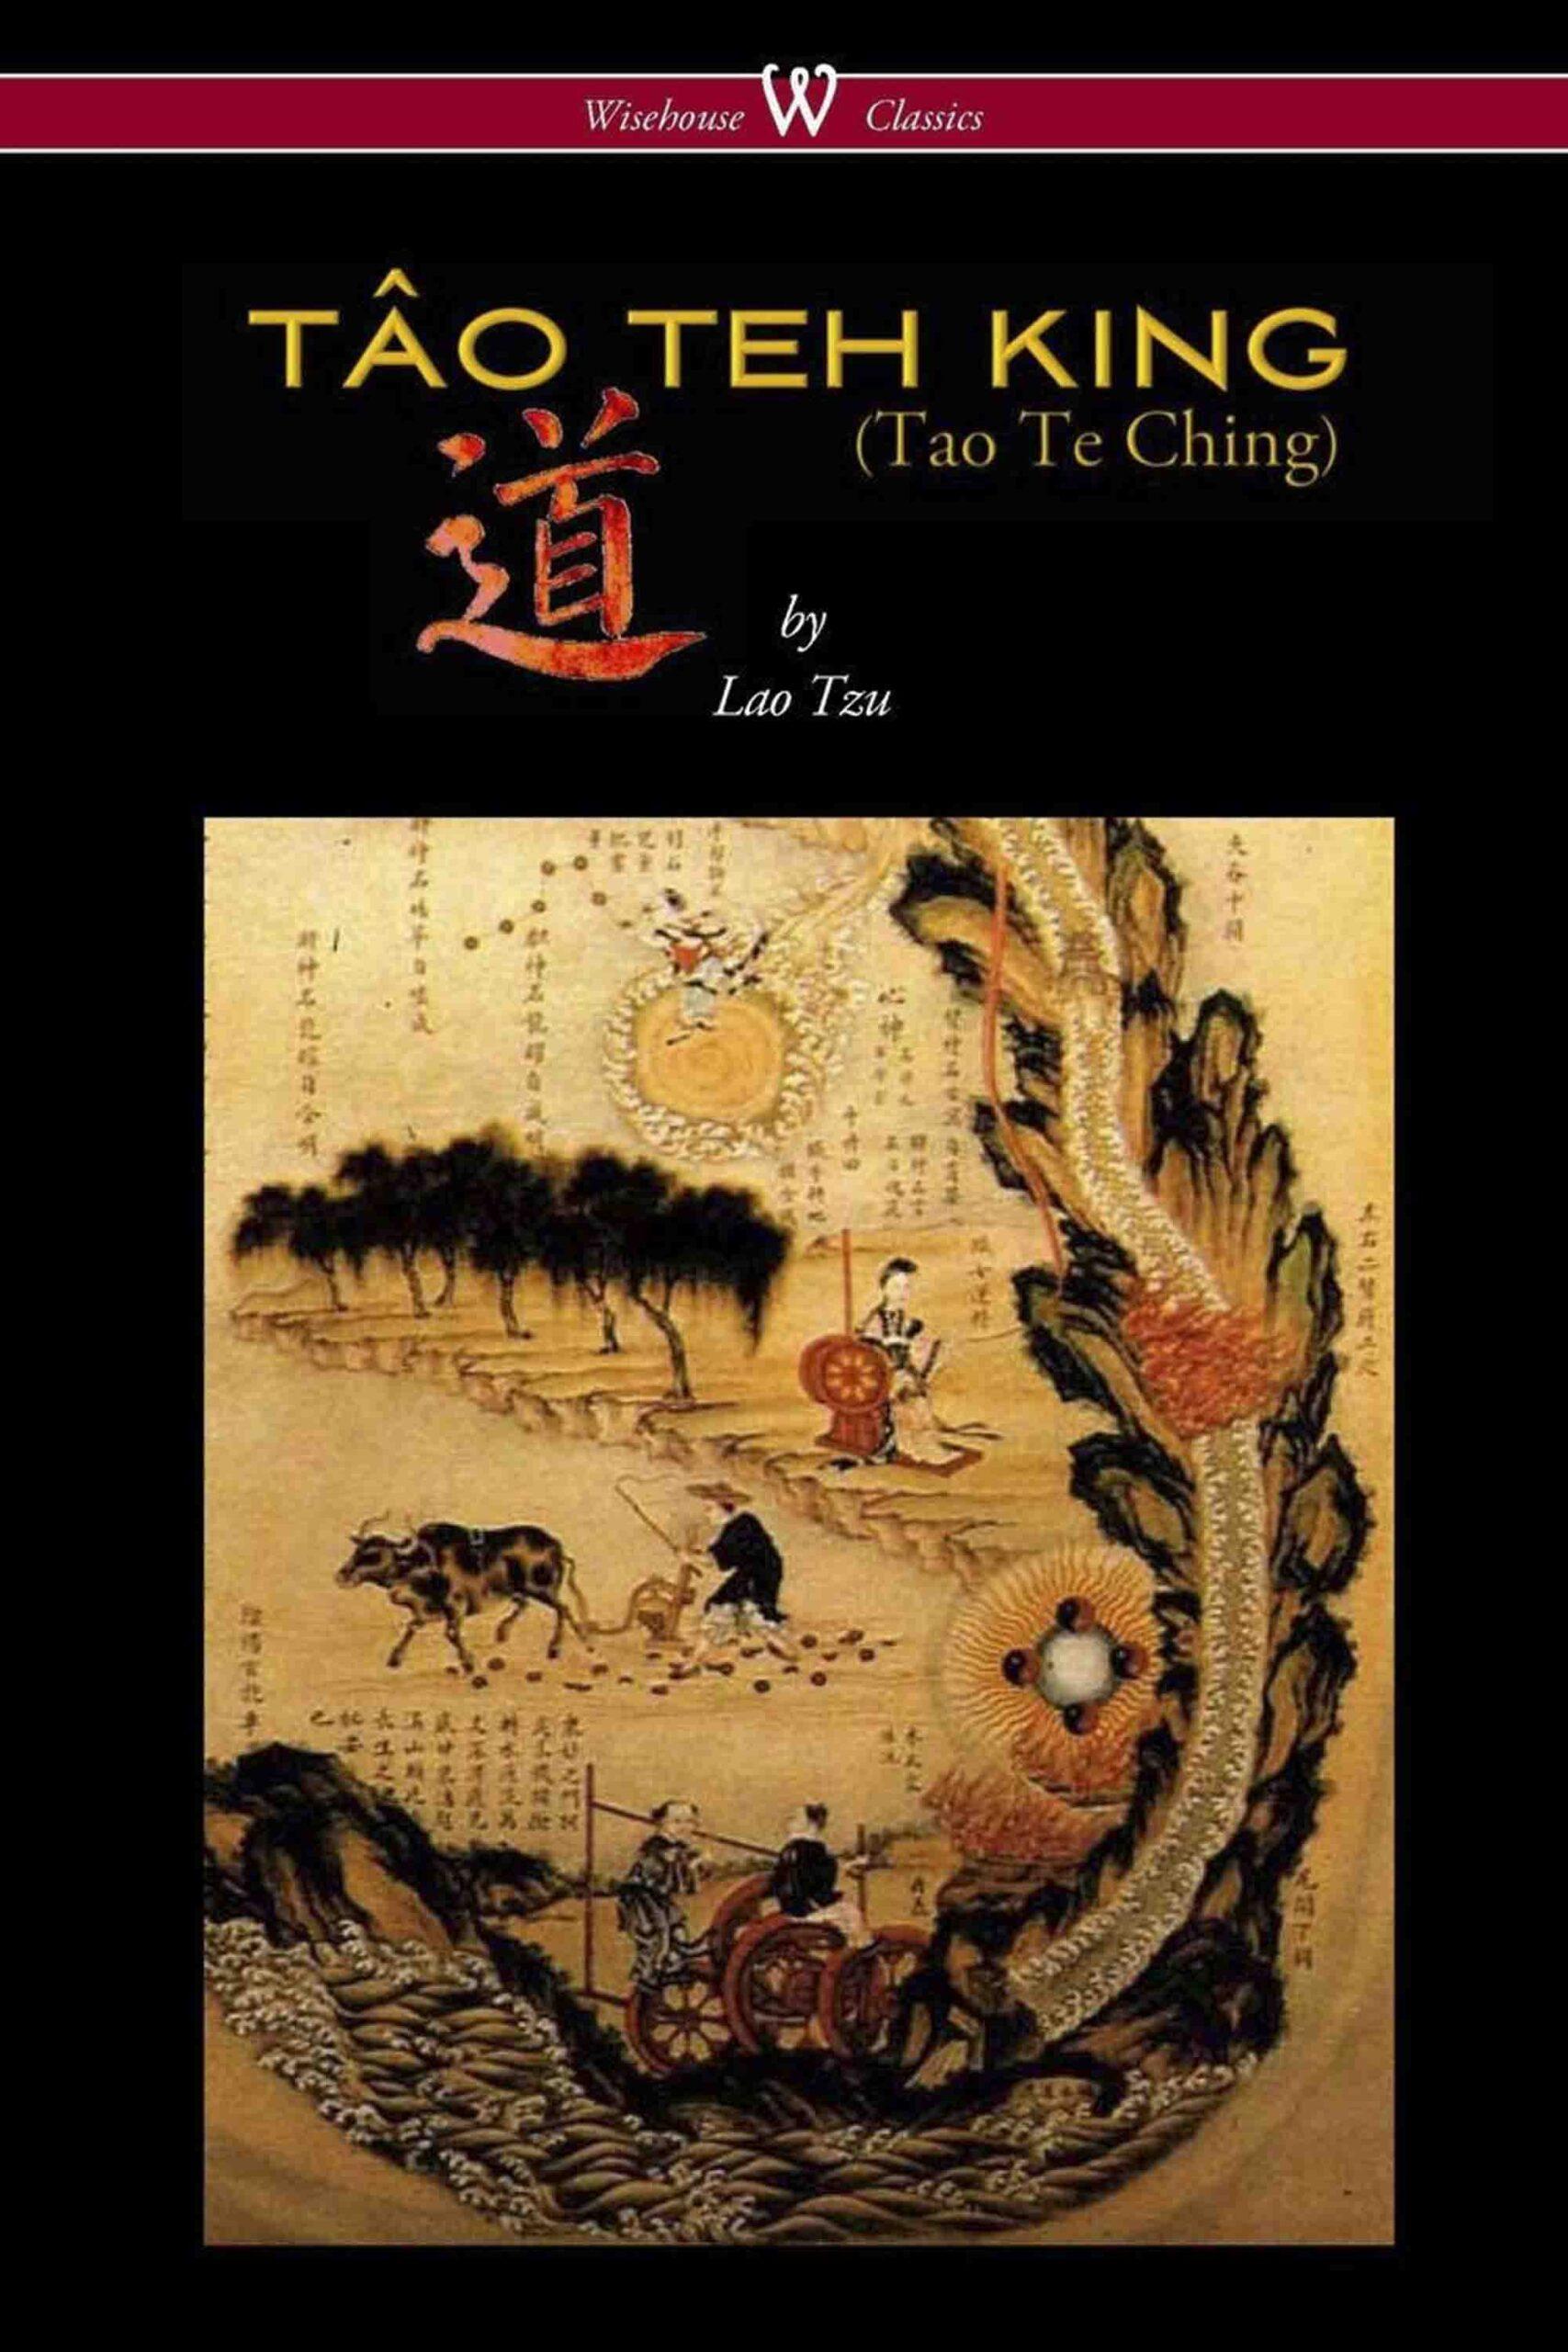 THE TÂO TEH KING (TAO TE CHING – Wisehouse Classics Edition)